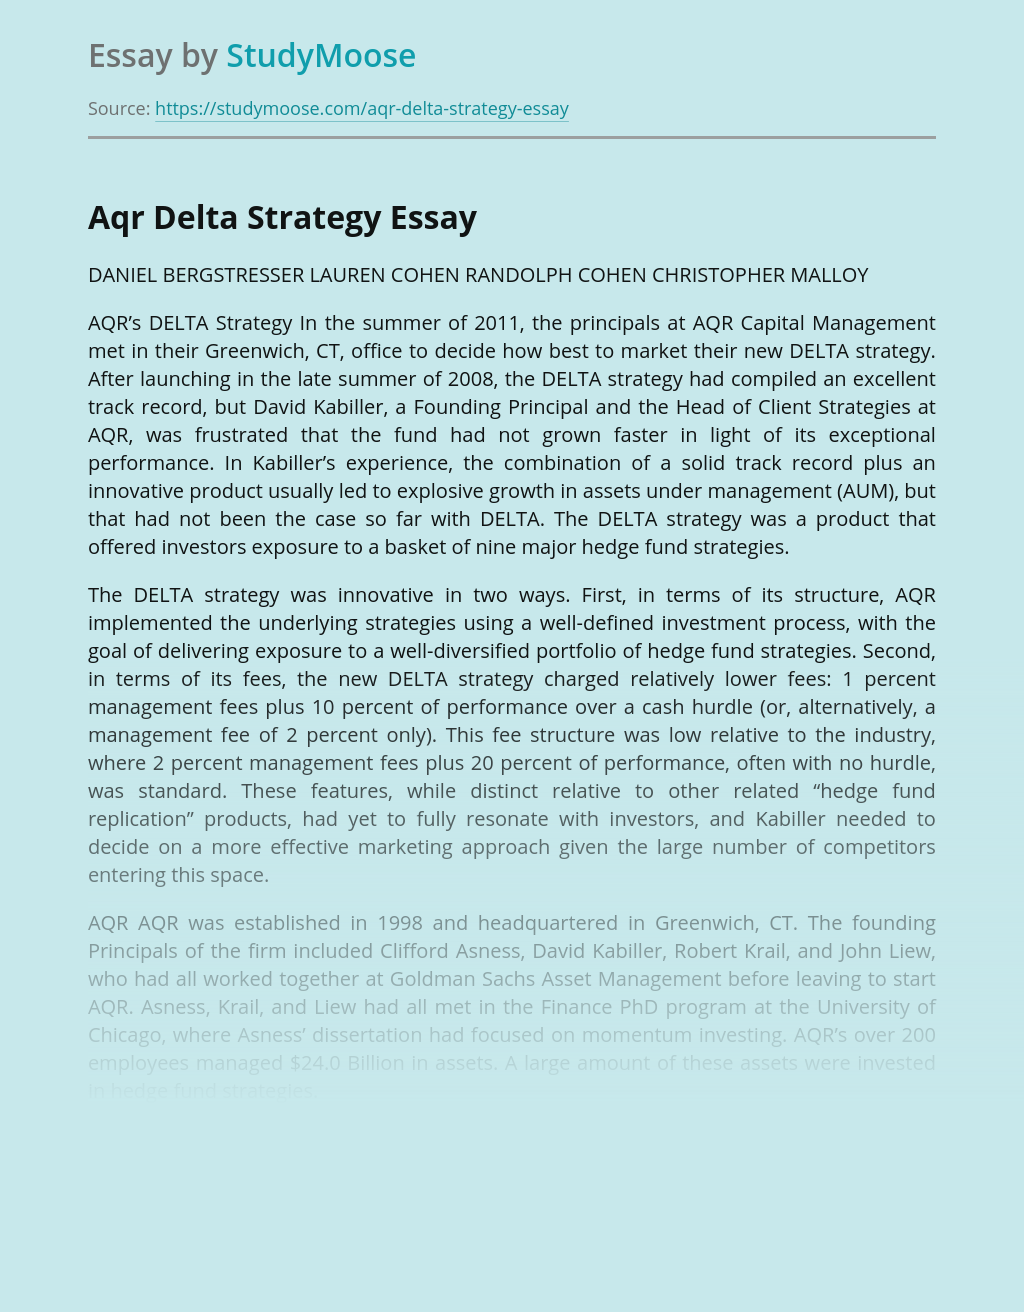 Aqr Delta Strategy